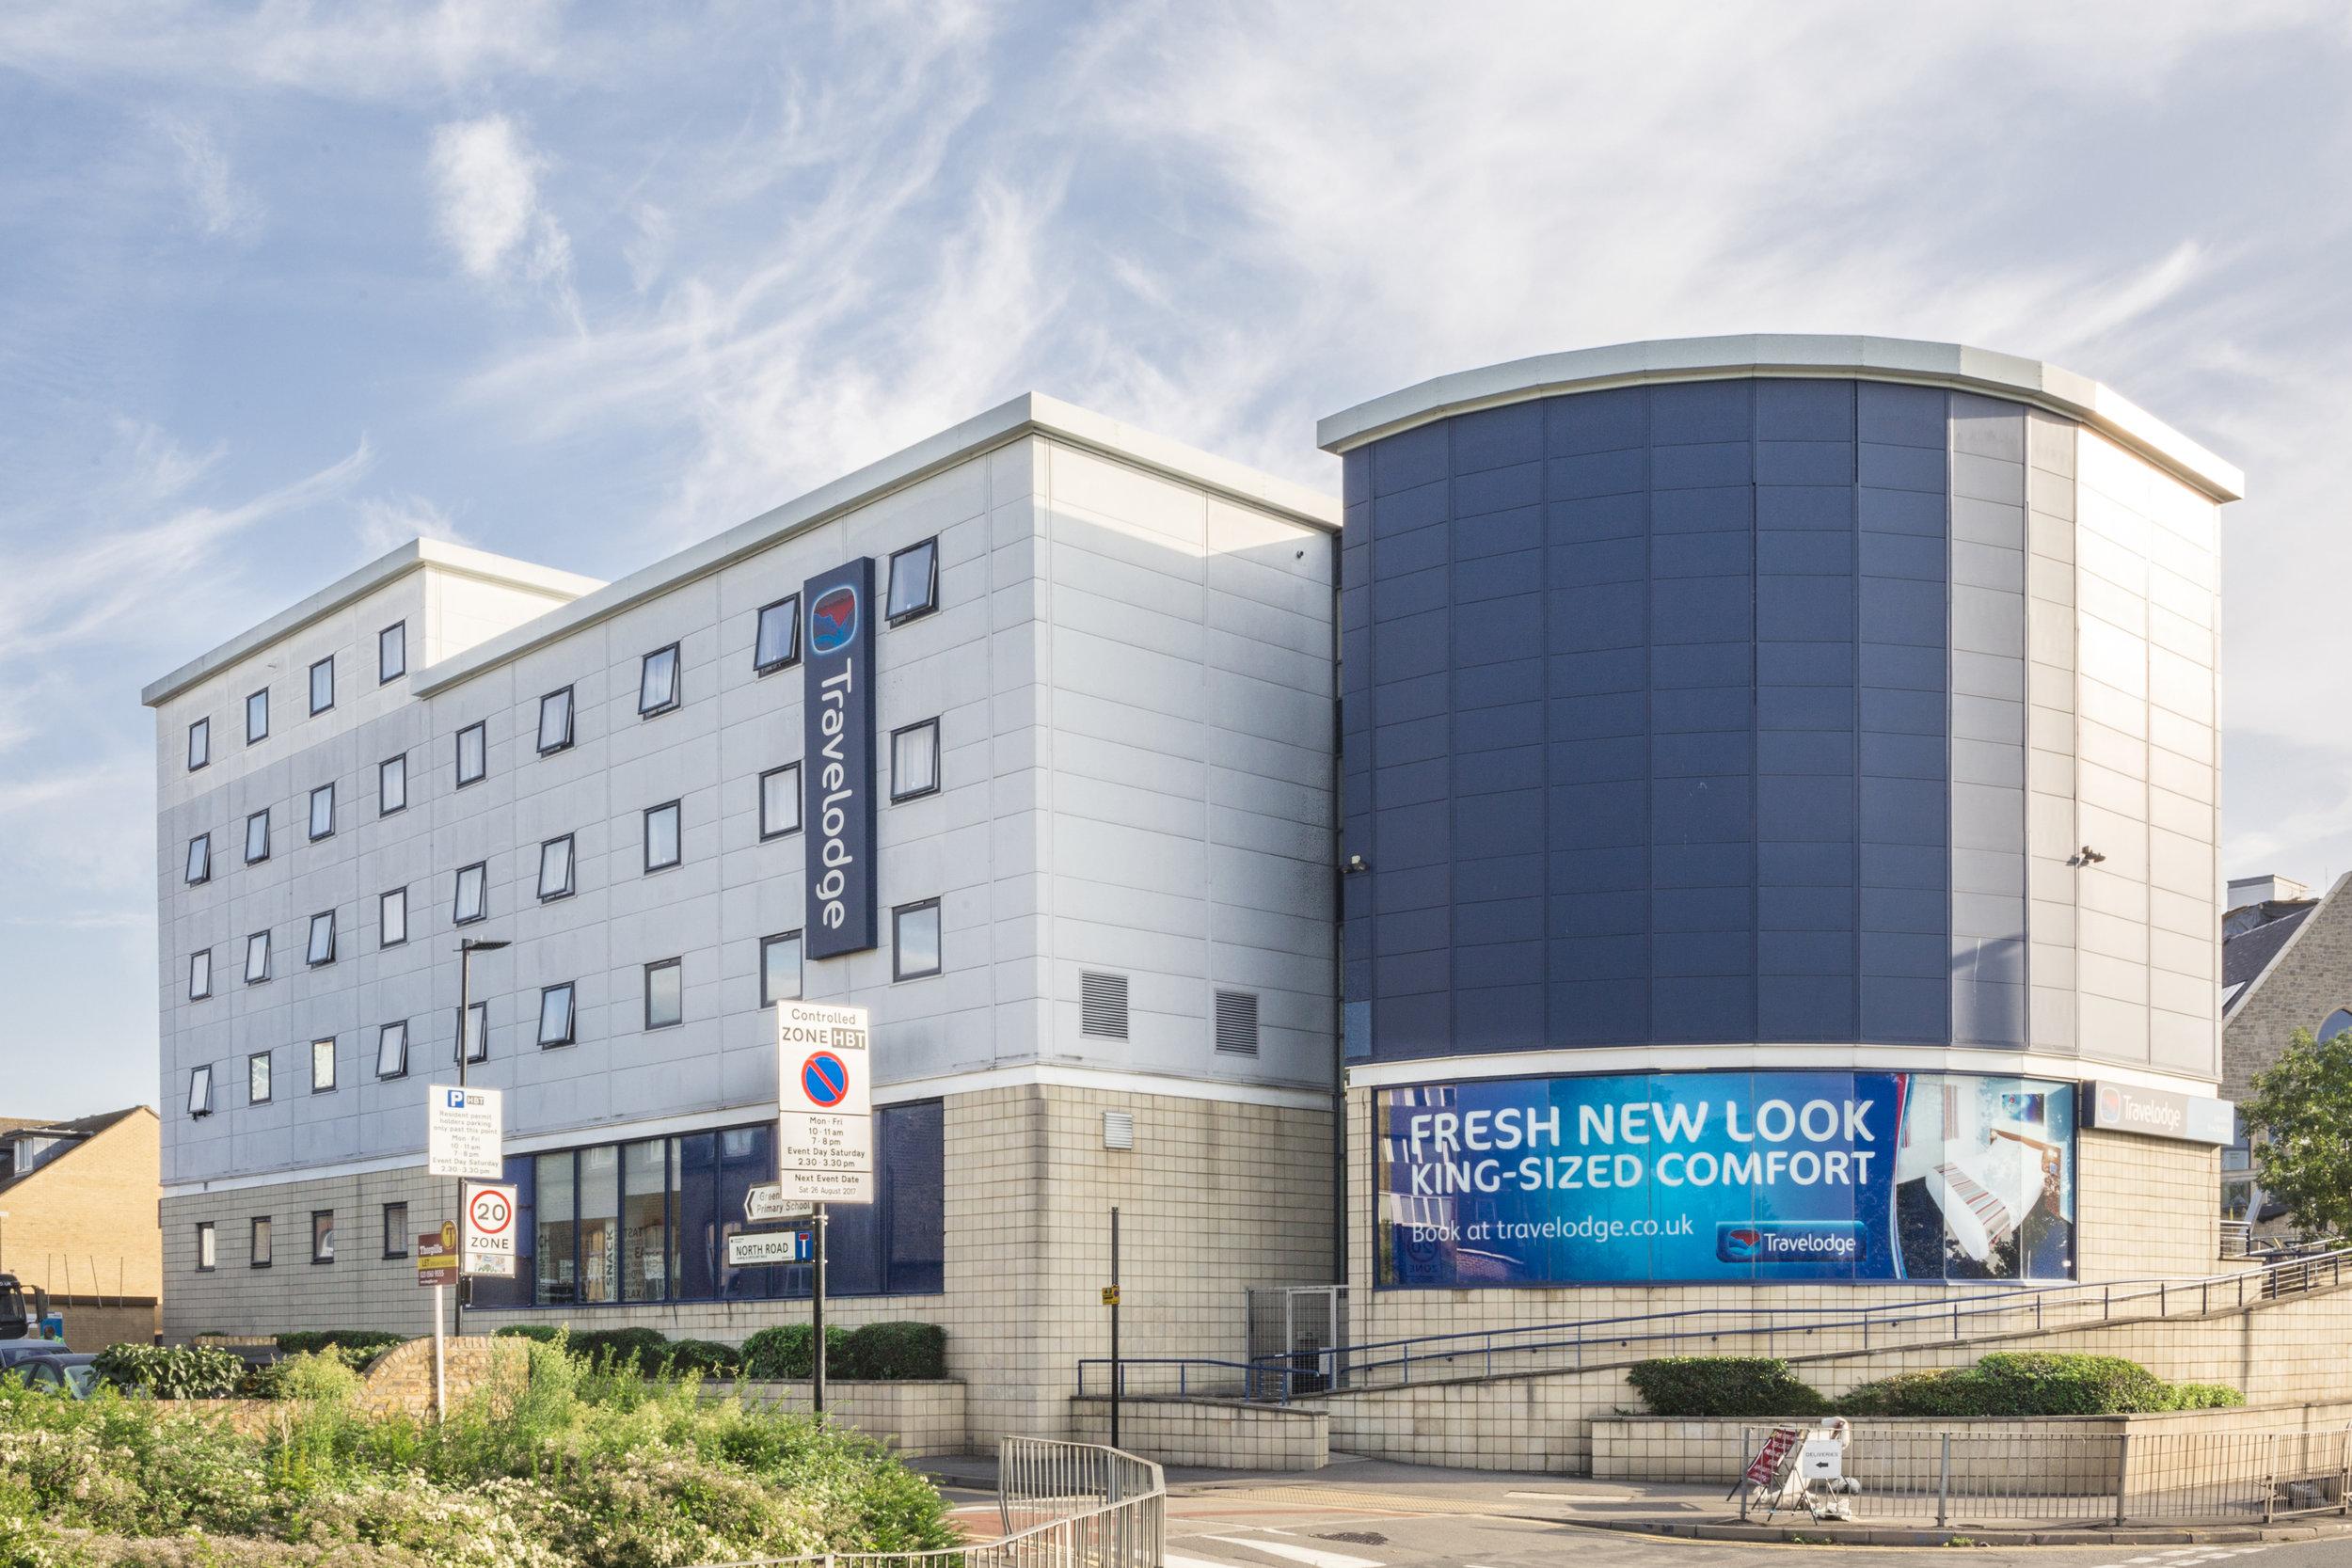 TRAVELODGE HOTEL PORTFOLIO - ACQUISITION    Grove London Portfolio   Acquisition of a portfolio of London Travelodge Hotels.   Client:  UK Prop Co   Vendor:  Godman Sachs   Price:  Circa £73m